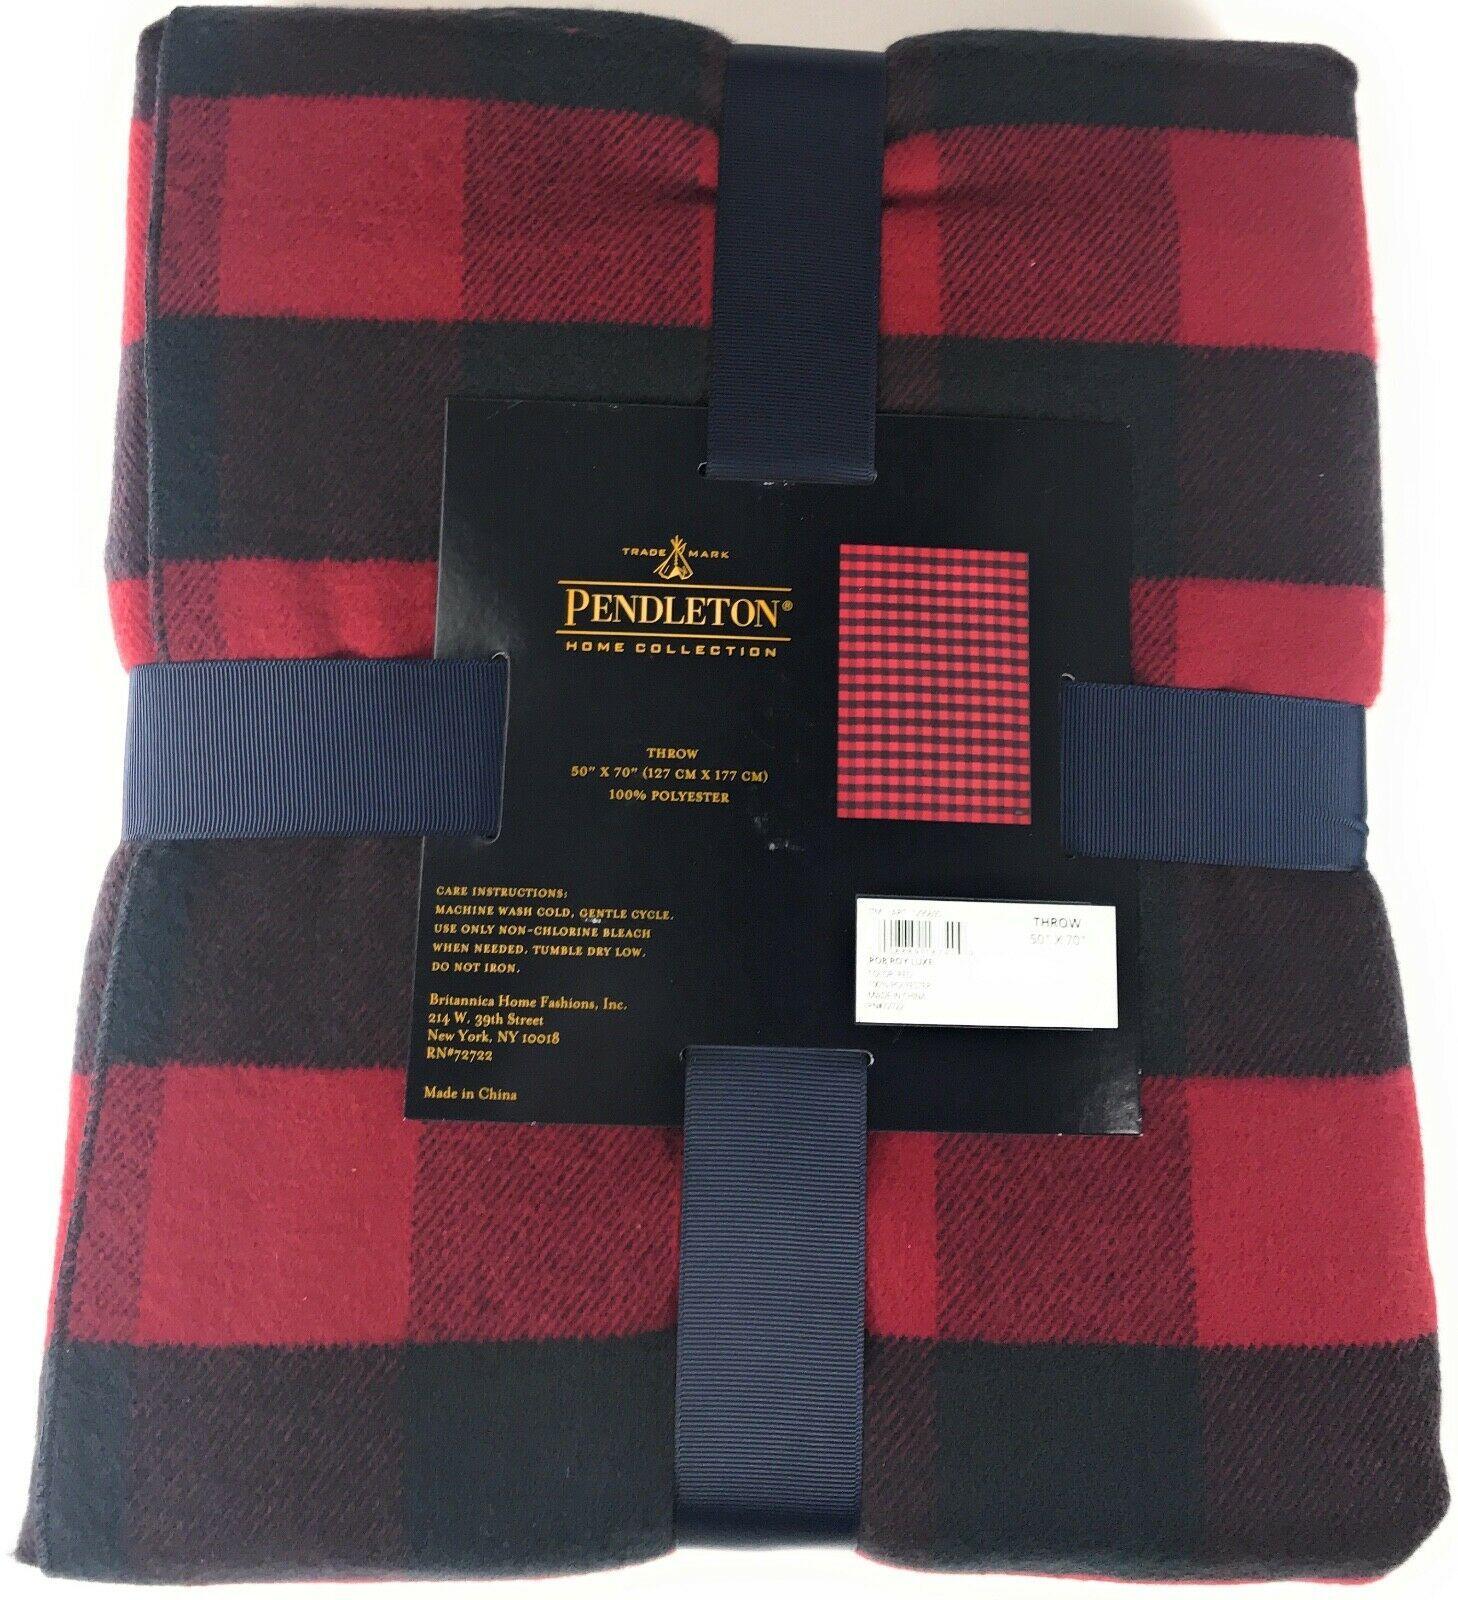 "Pendleton Rob Roy Luxe 100% Polyester 50""x70"" Throw Blanket Red Navy Plaid NWT"